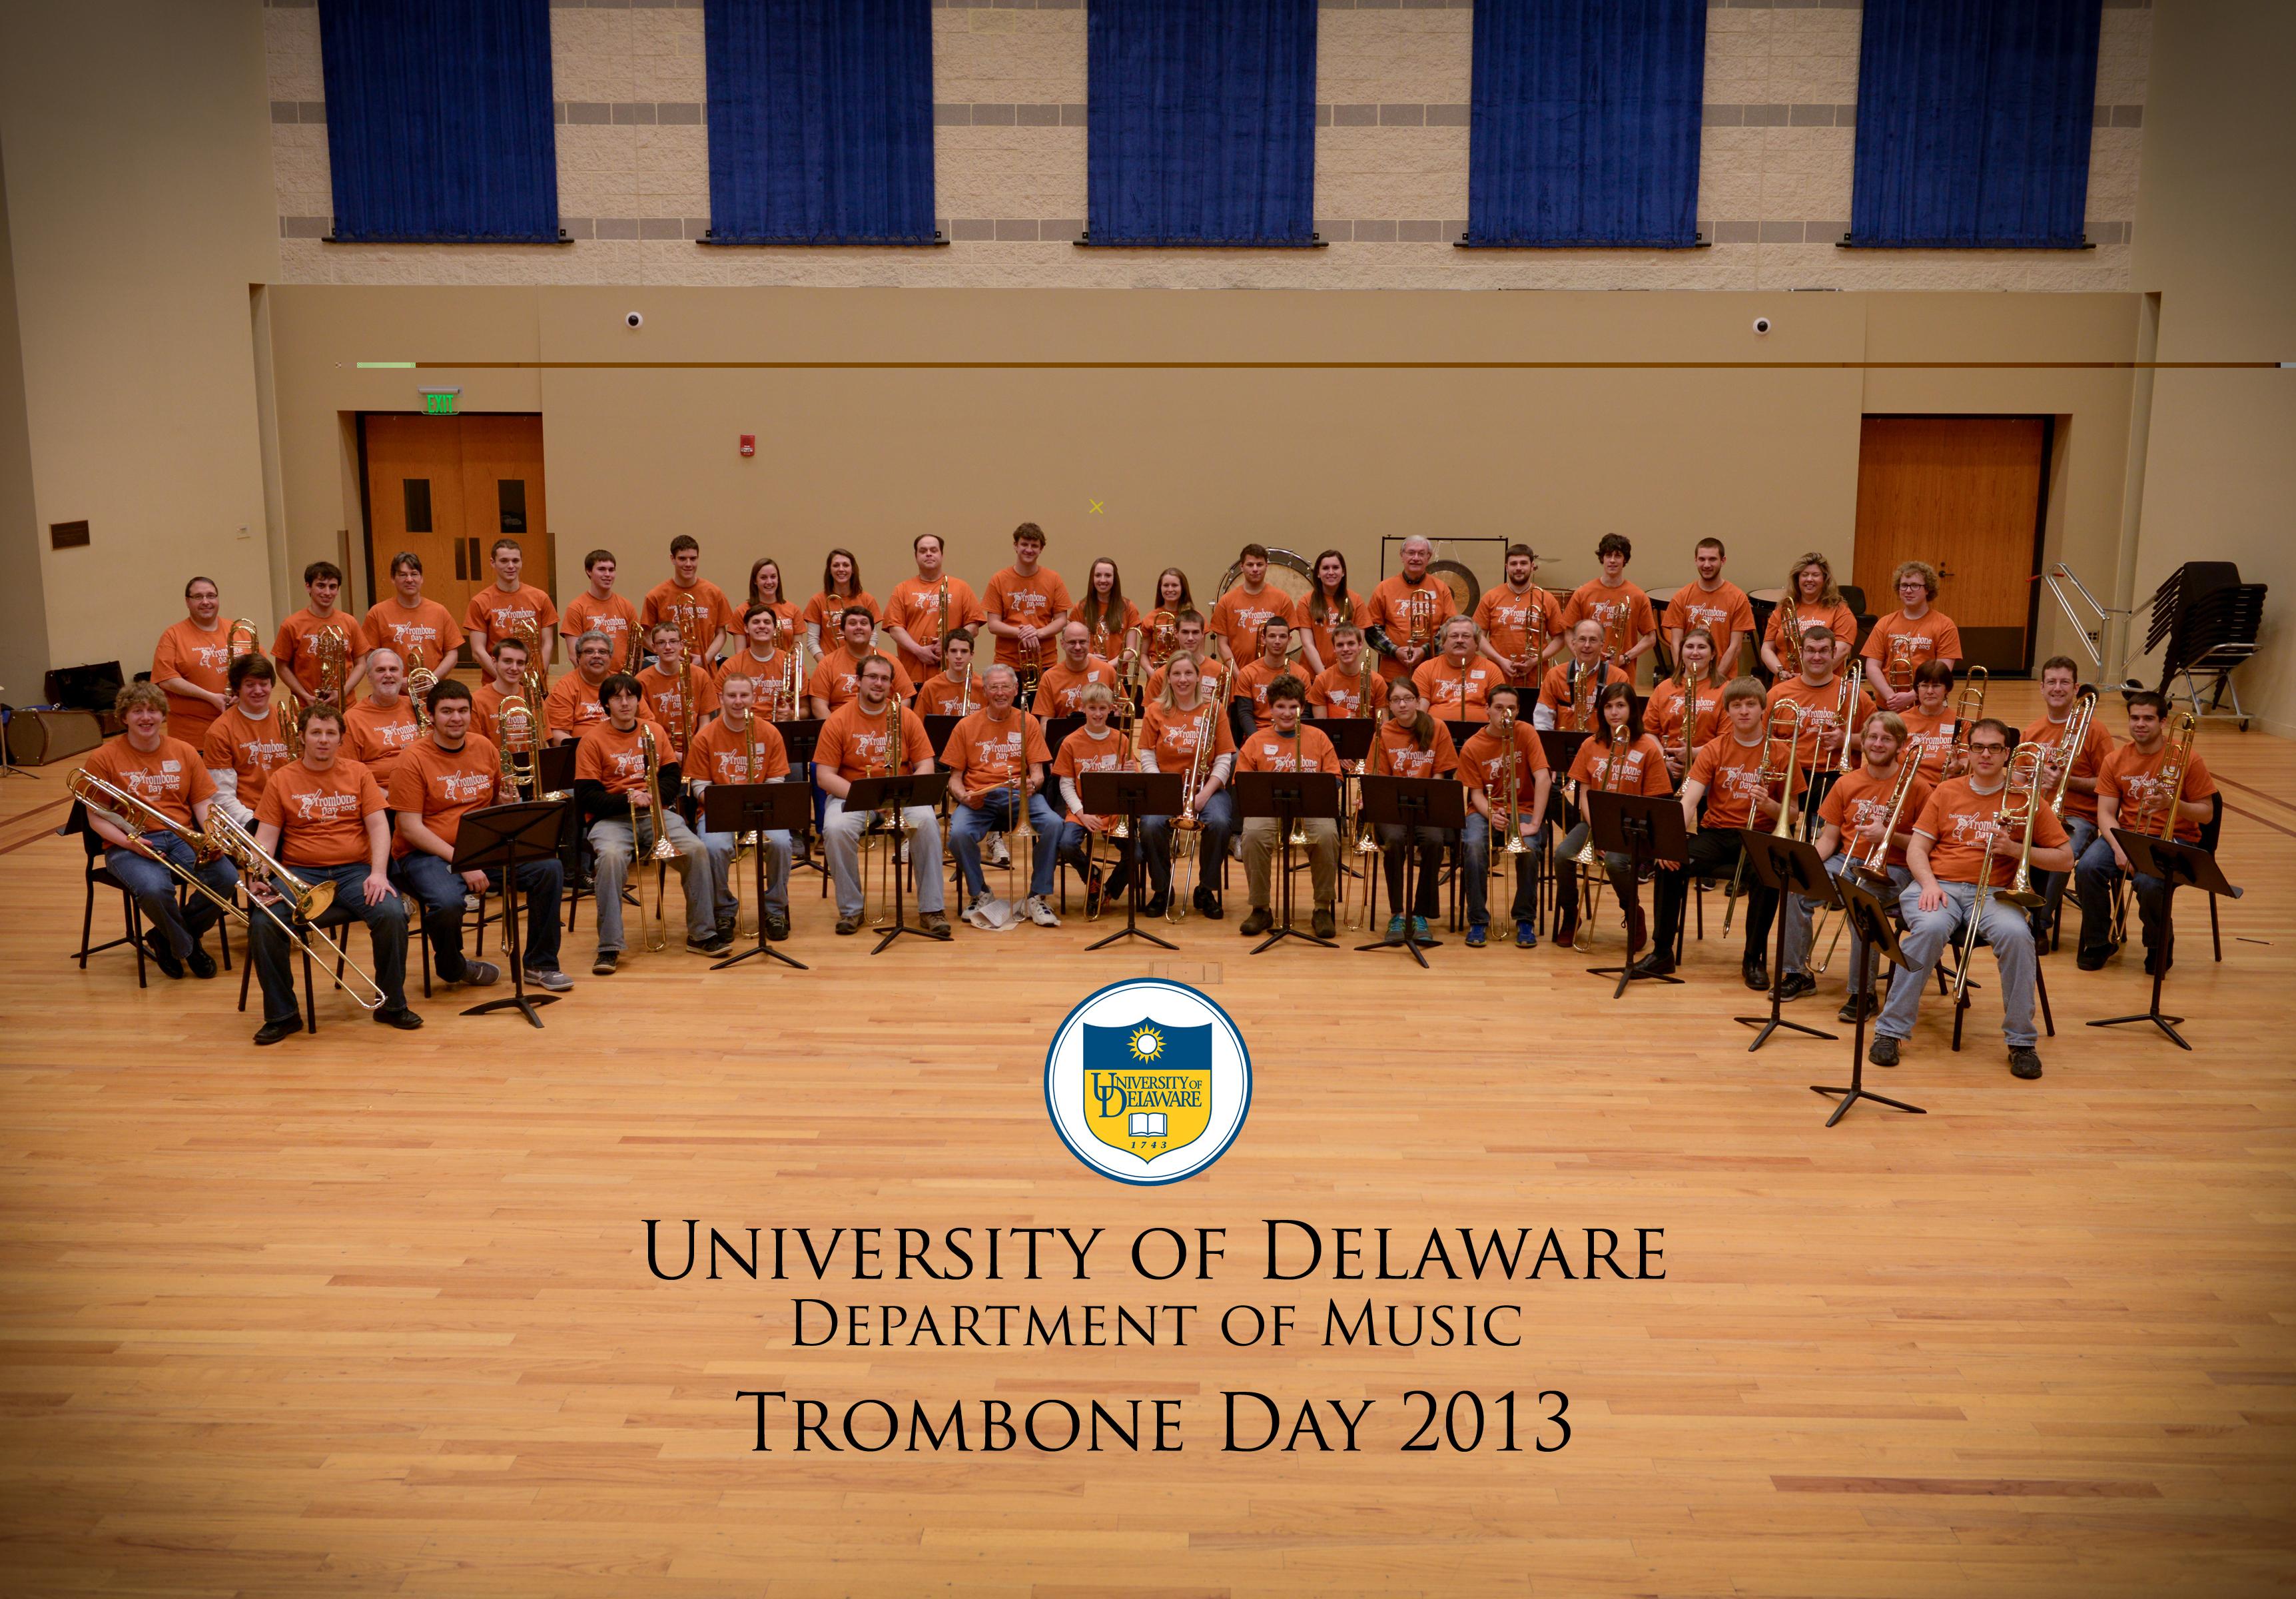 Trombone Day 2013